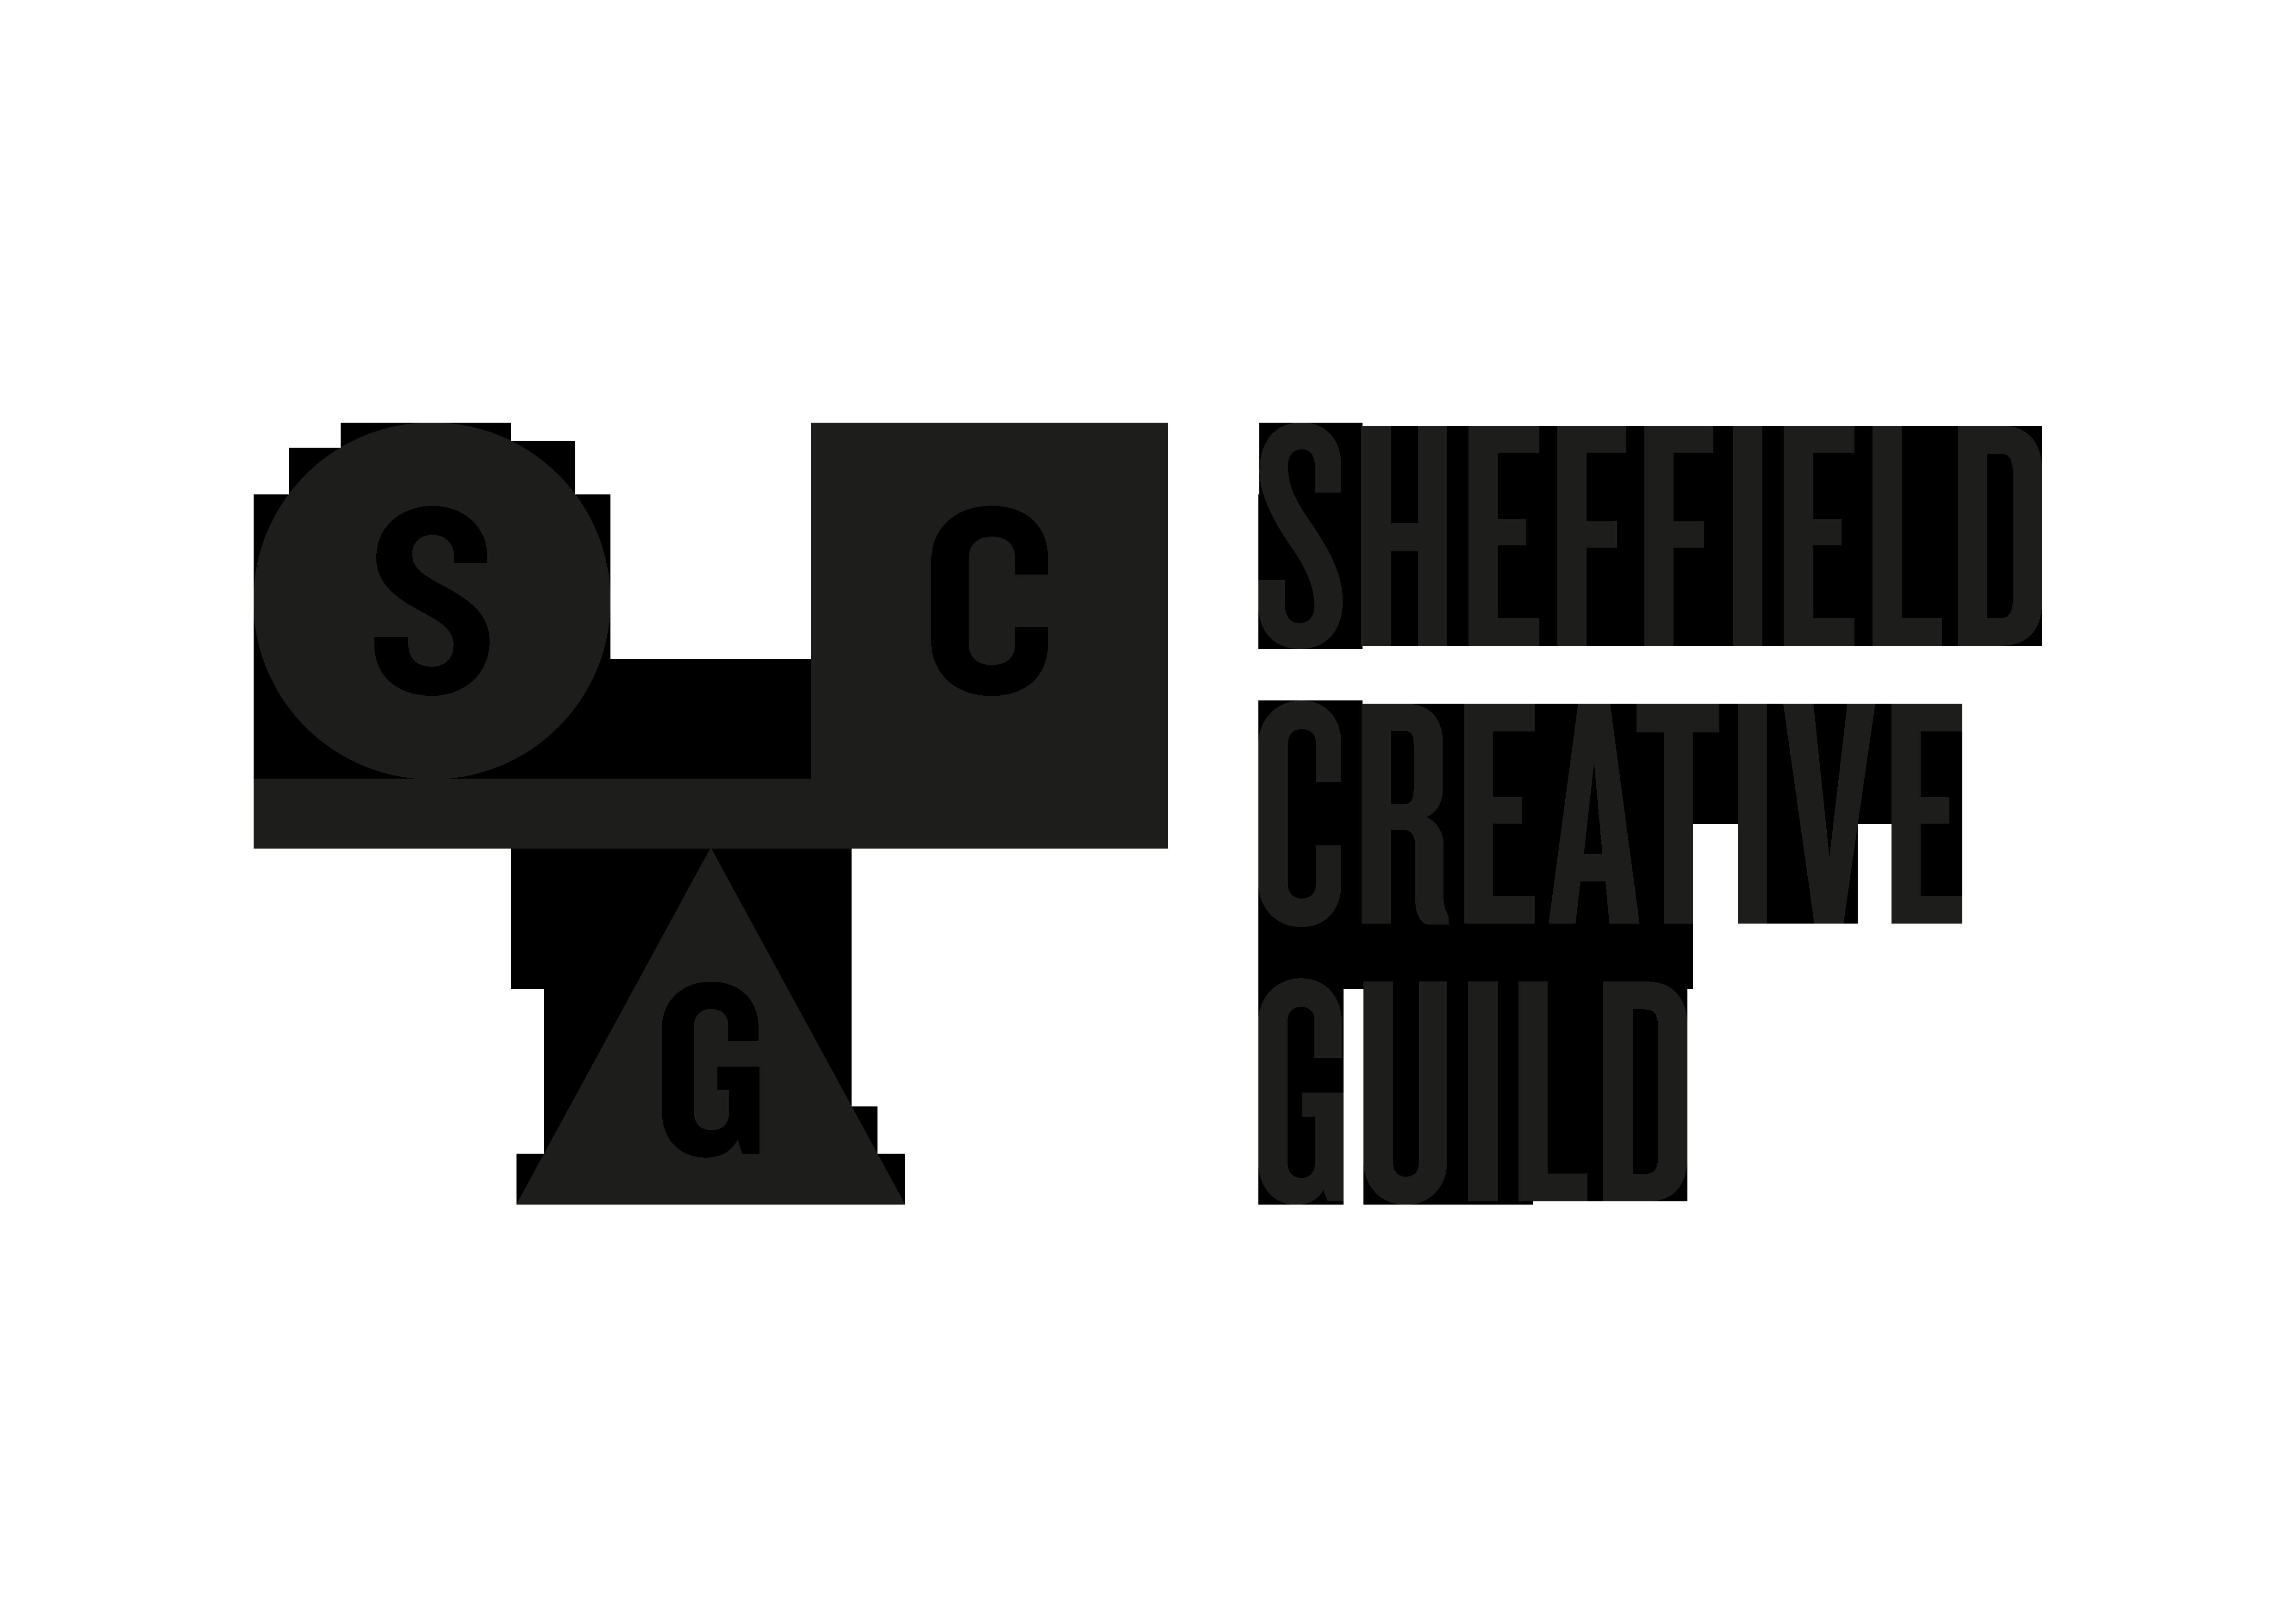 Sheffield Creative Guild Funding Workshops: Monitoring & Evaluation